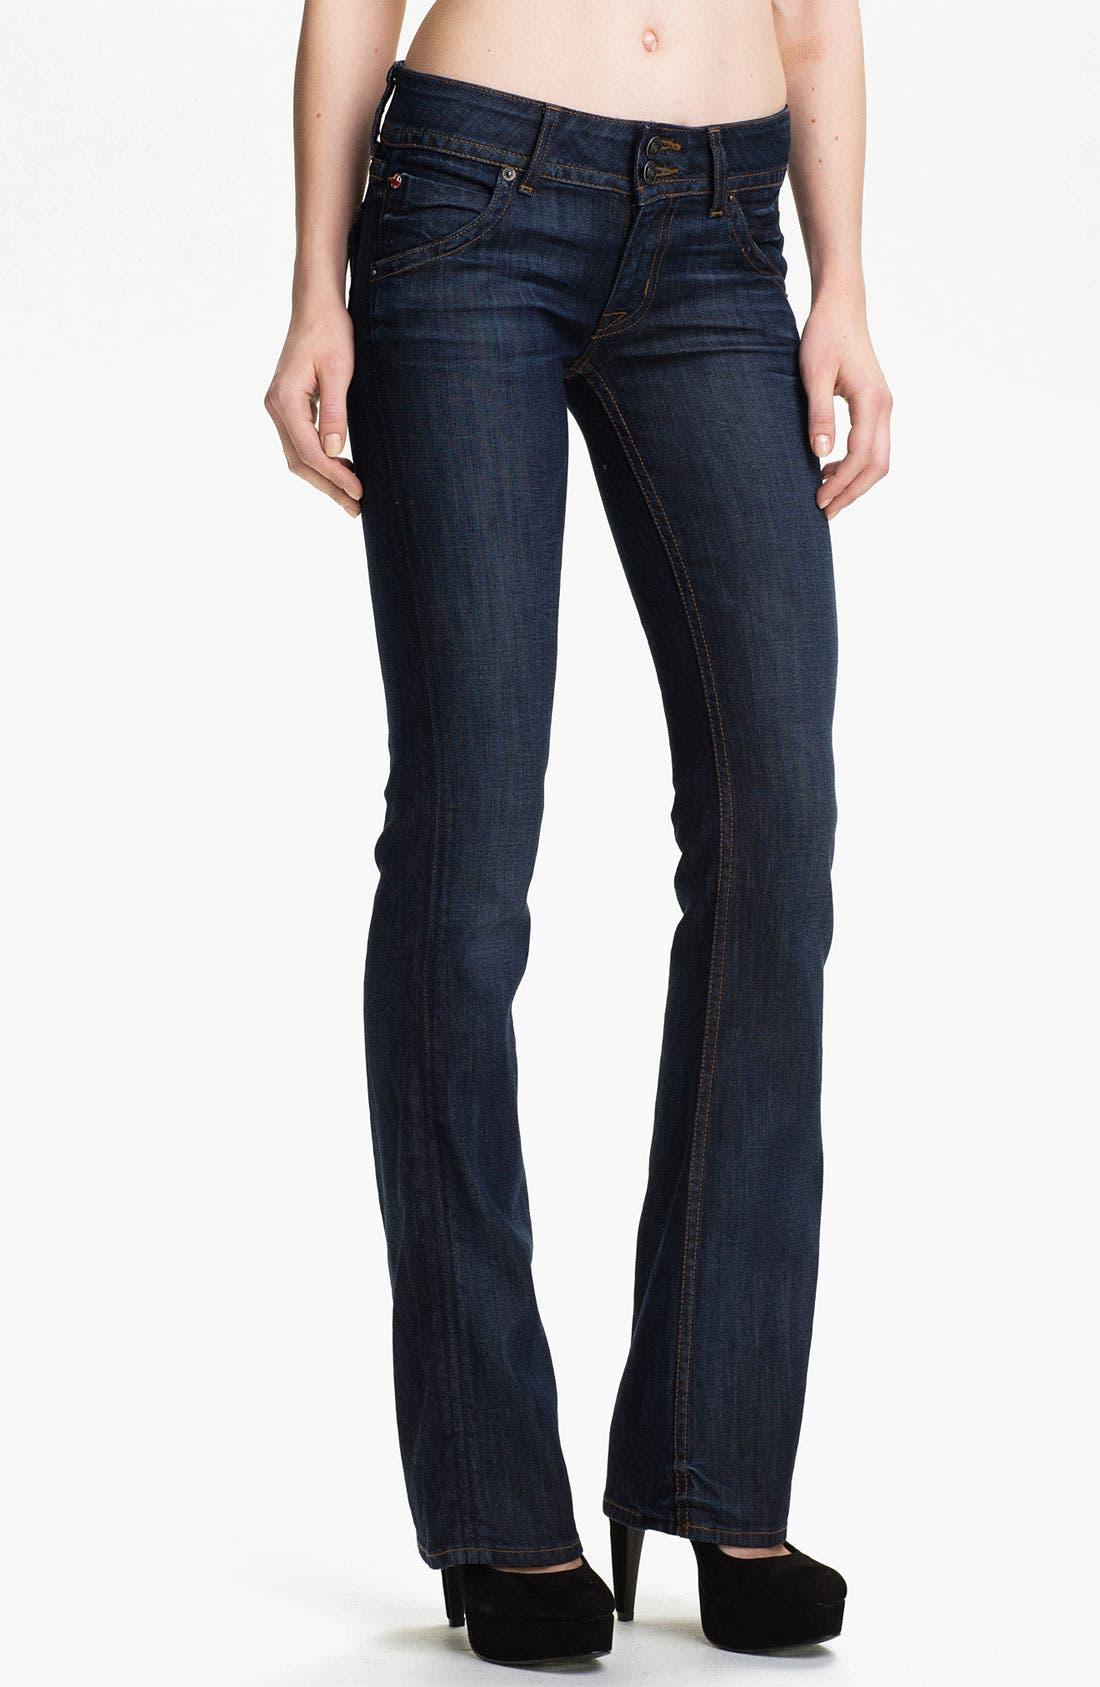 Alternate Image 1 Selected - Hudson Jeans Signature Bootcut Jeans (Merton)